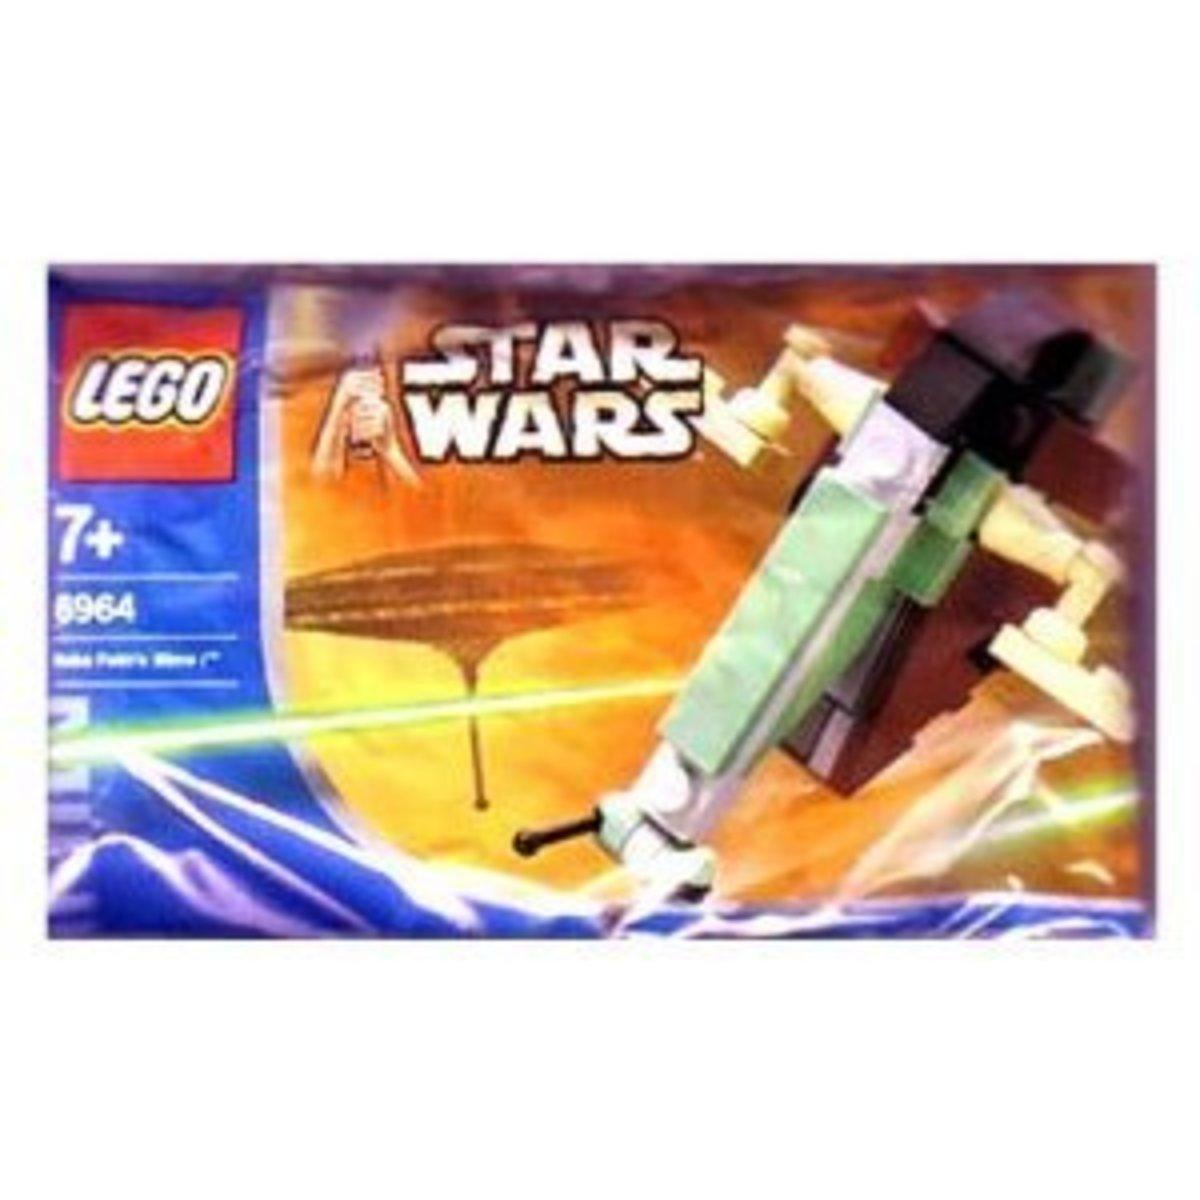 LEGO Star Wars Boba Fett Slave 1 6964 Bag